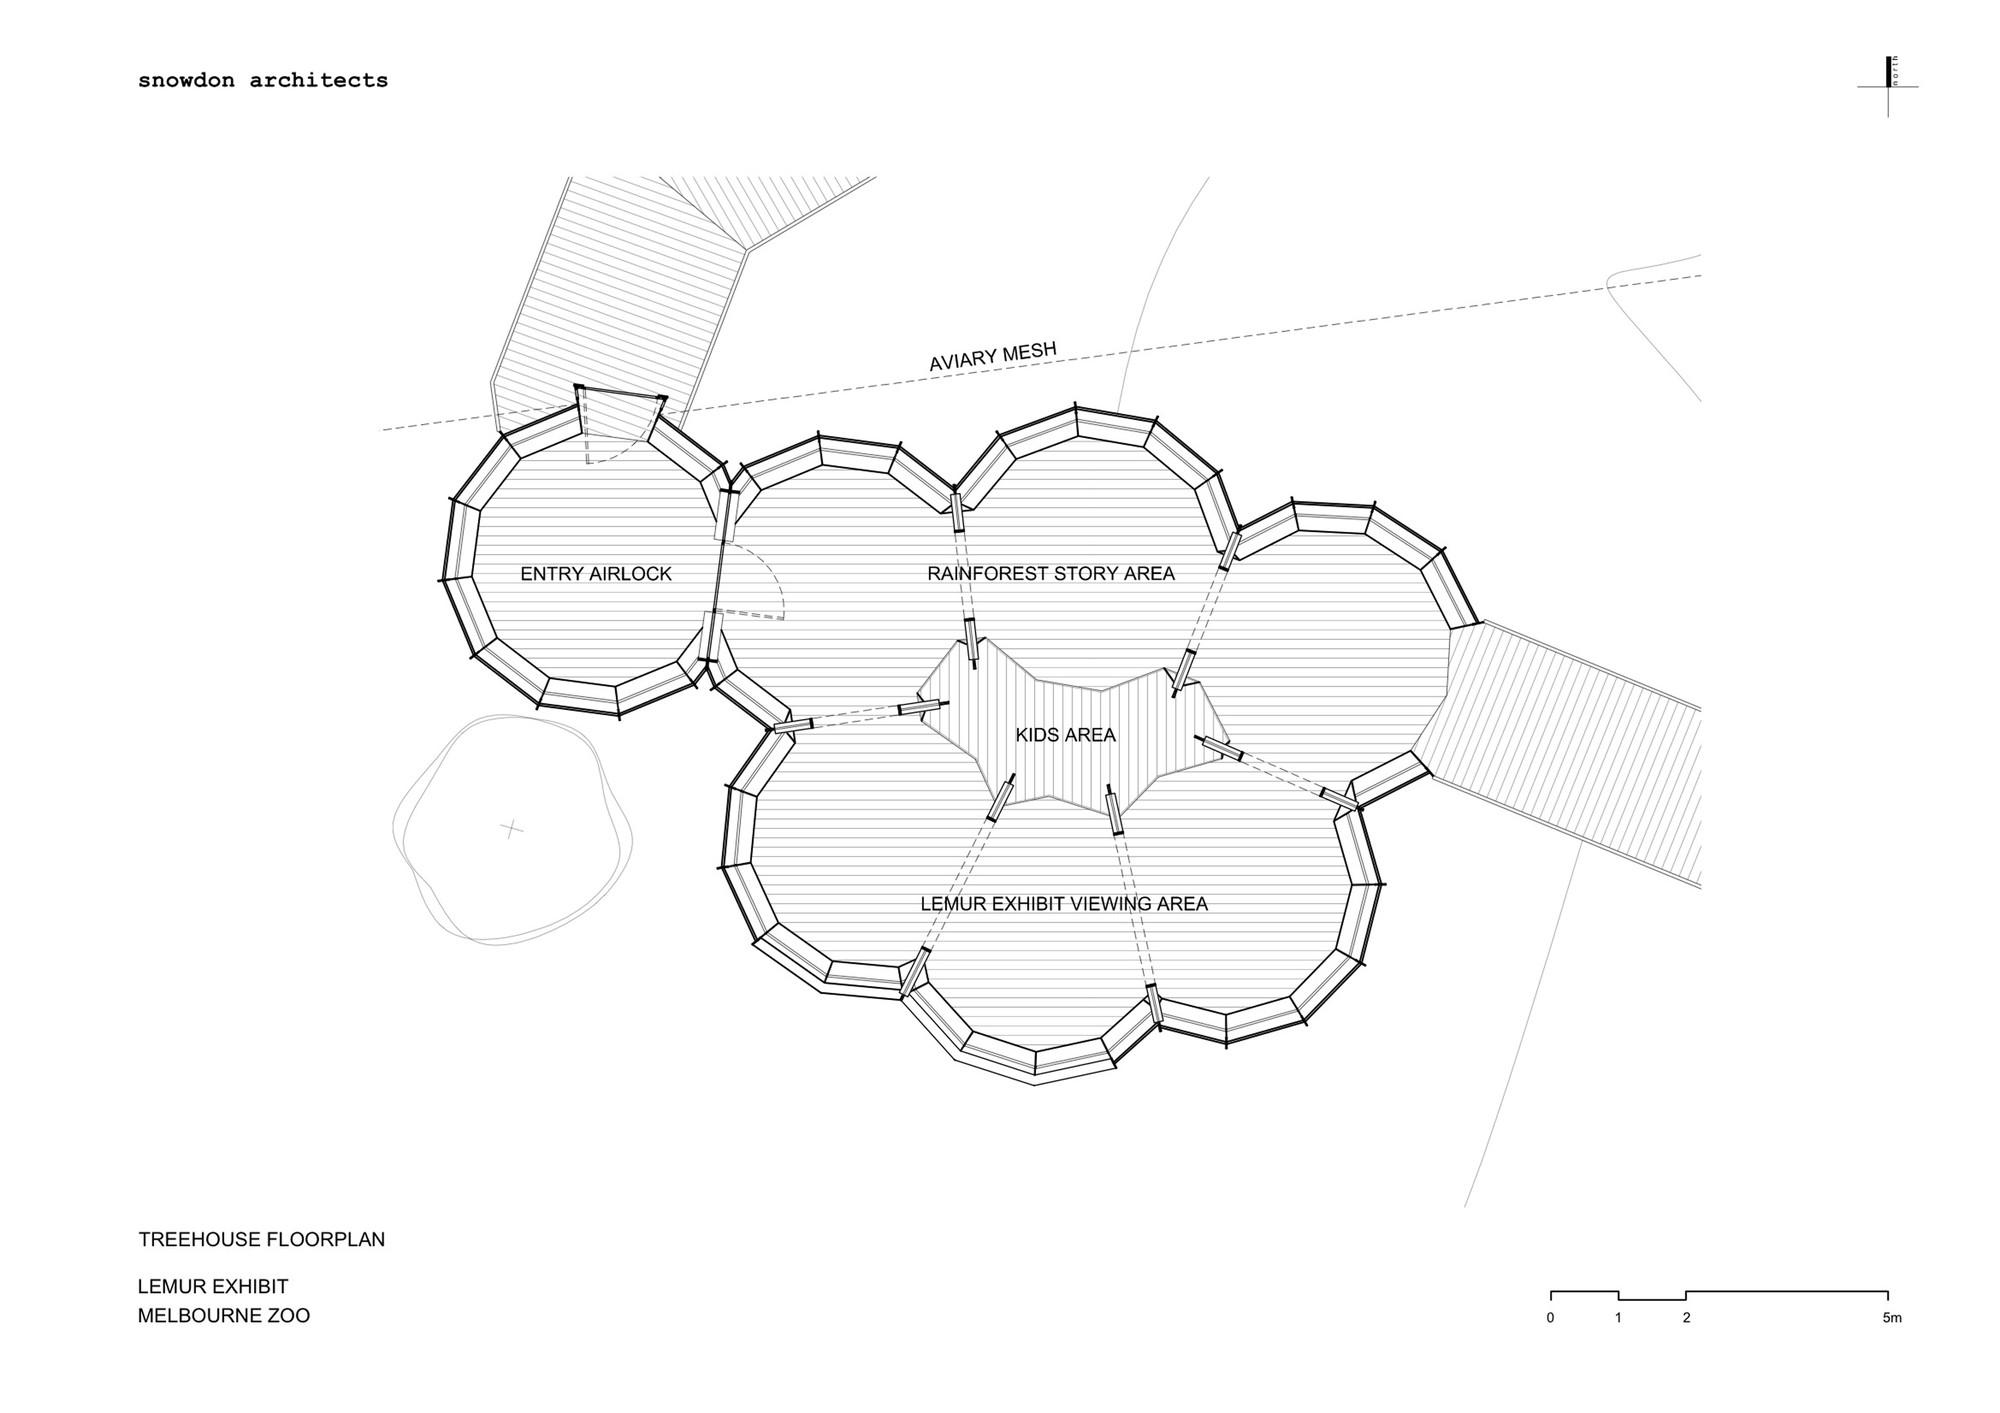 gallery of lemur exhibit snowdon architects 14 theehouse floor plan